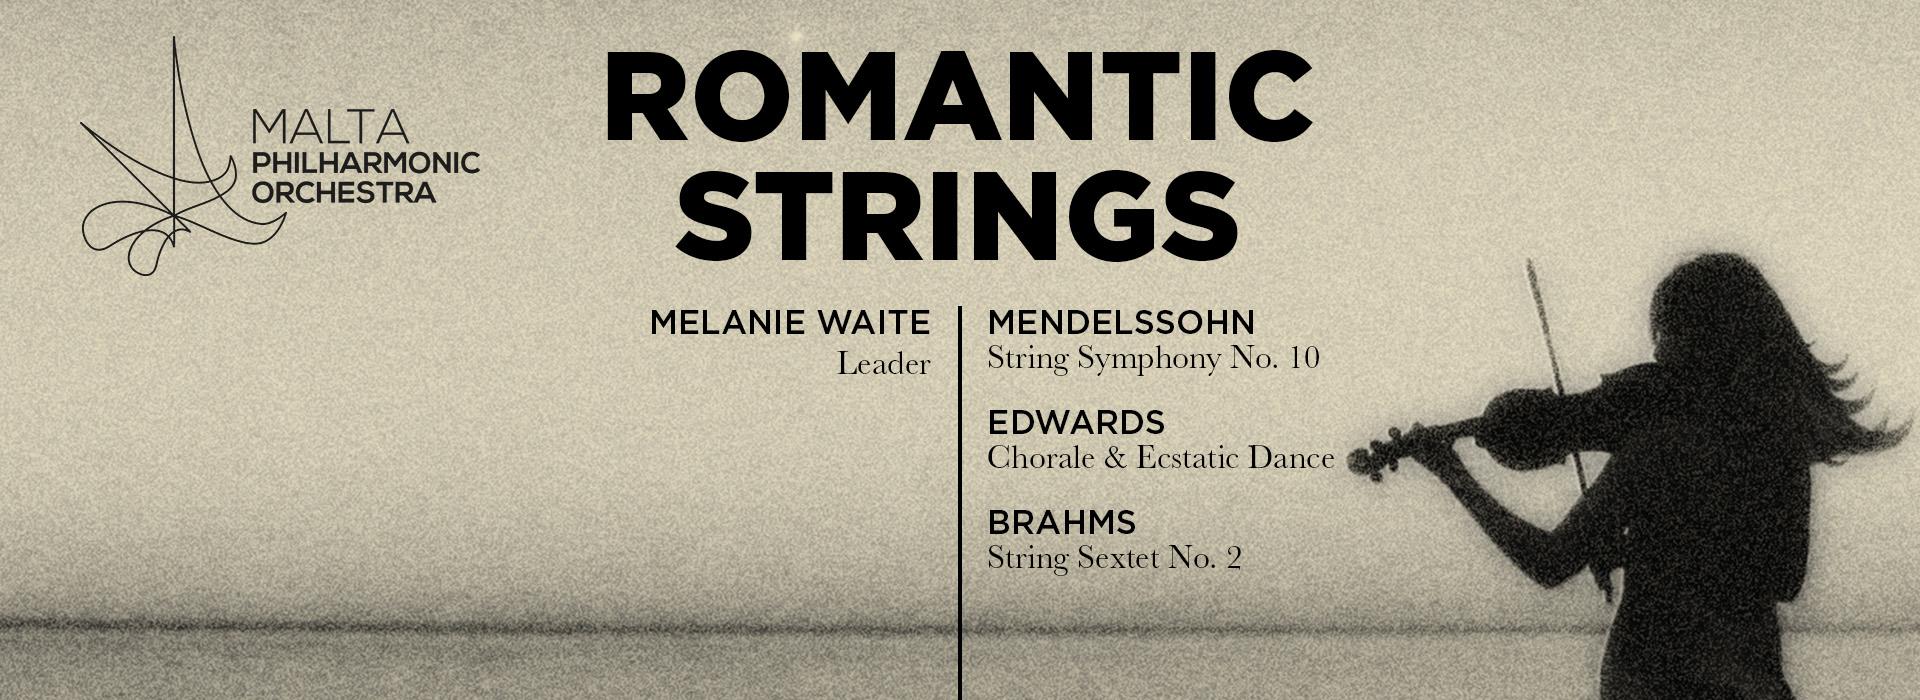 Romantic Strings